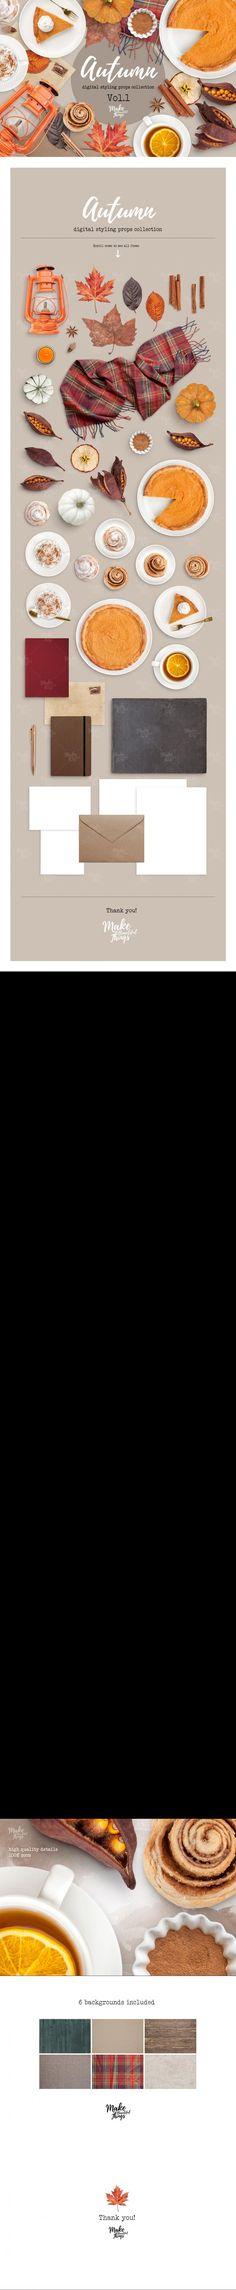 Autumn Scene Creator #movableset #TemplateDesign #scene #autumn #customscene #psd #tube #pumpkin #SceneGenerators #realistic #printing #mockup #SceneCreator #happy #weddingsuite #template #isolated #identitycard #background Scene Creator, The Creator, Autumn Scenes, Generators, Wedding Suits, Mockup, Tube, Fonts, Printing